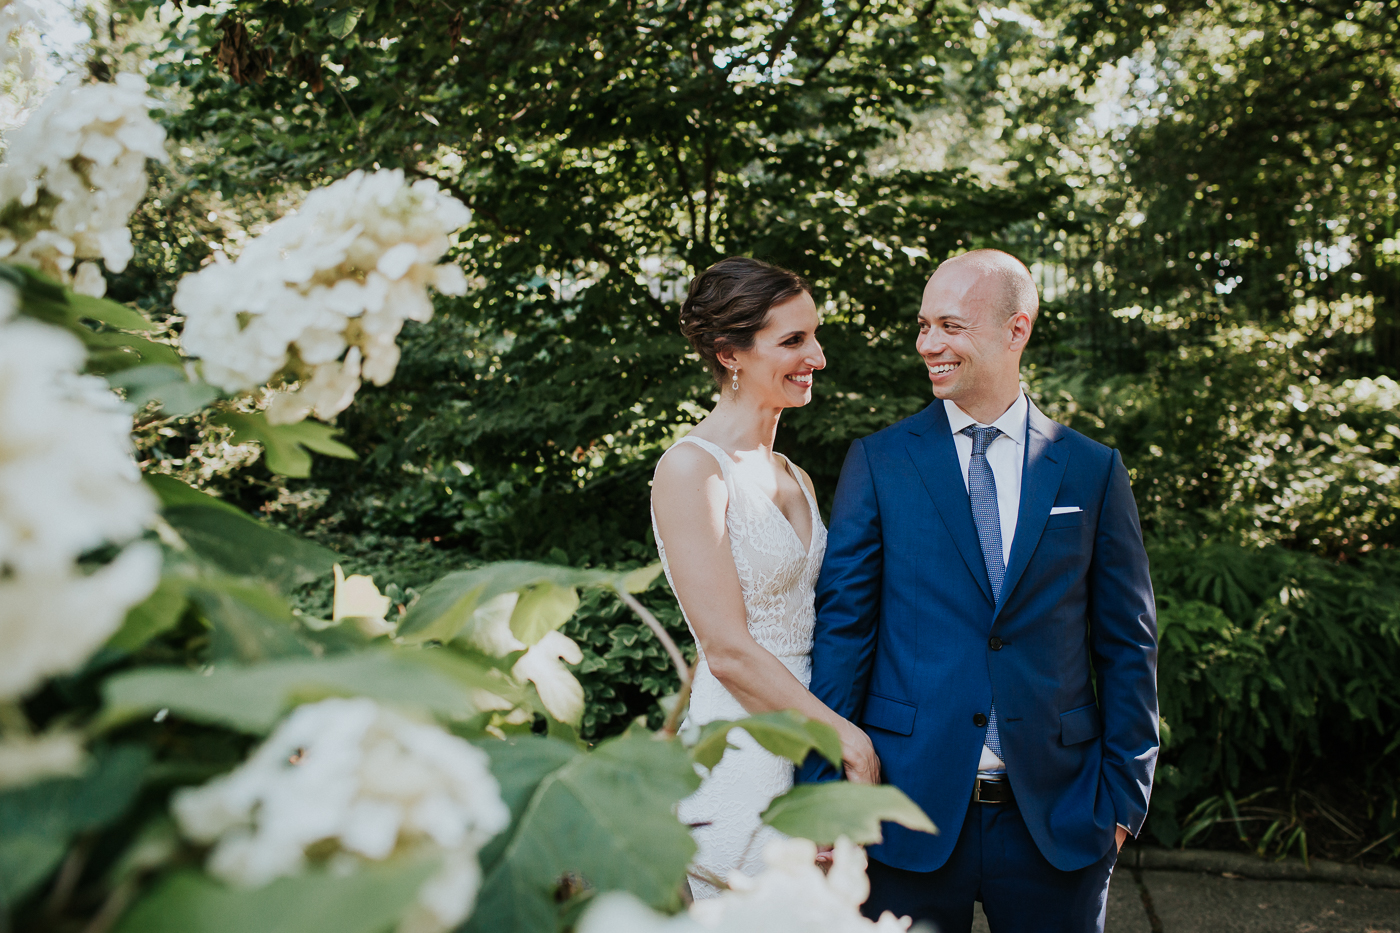 NYC-Central-Park-Conservatory-Garden-Intimate-Elopement-Documentary-Wedding-Photographer-43.jpg